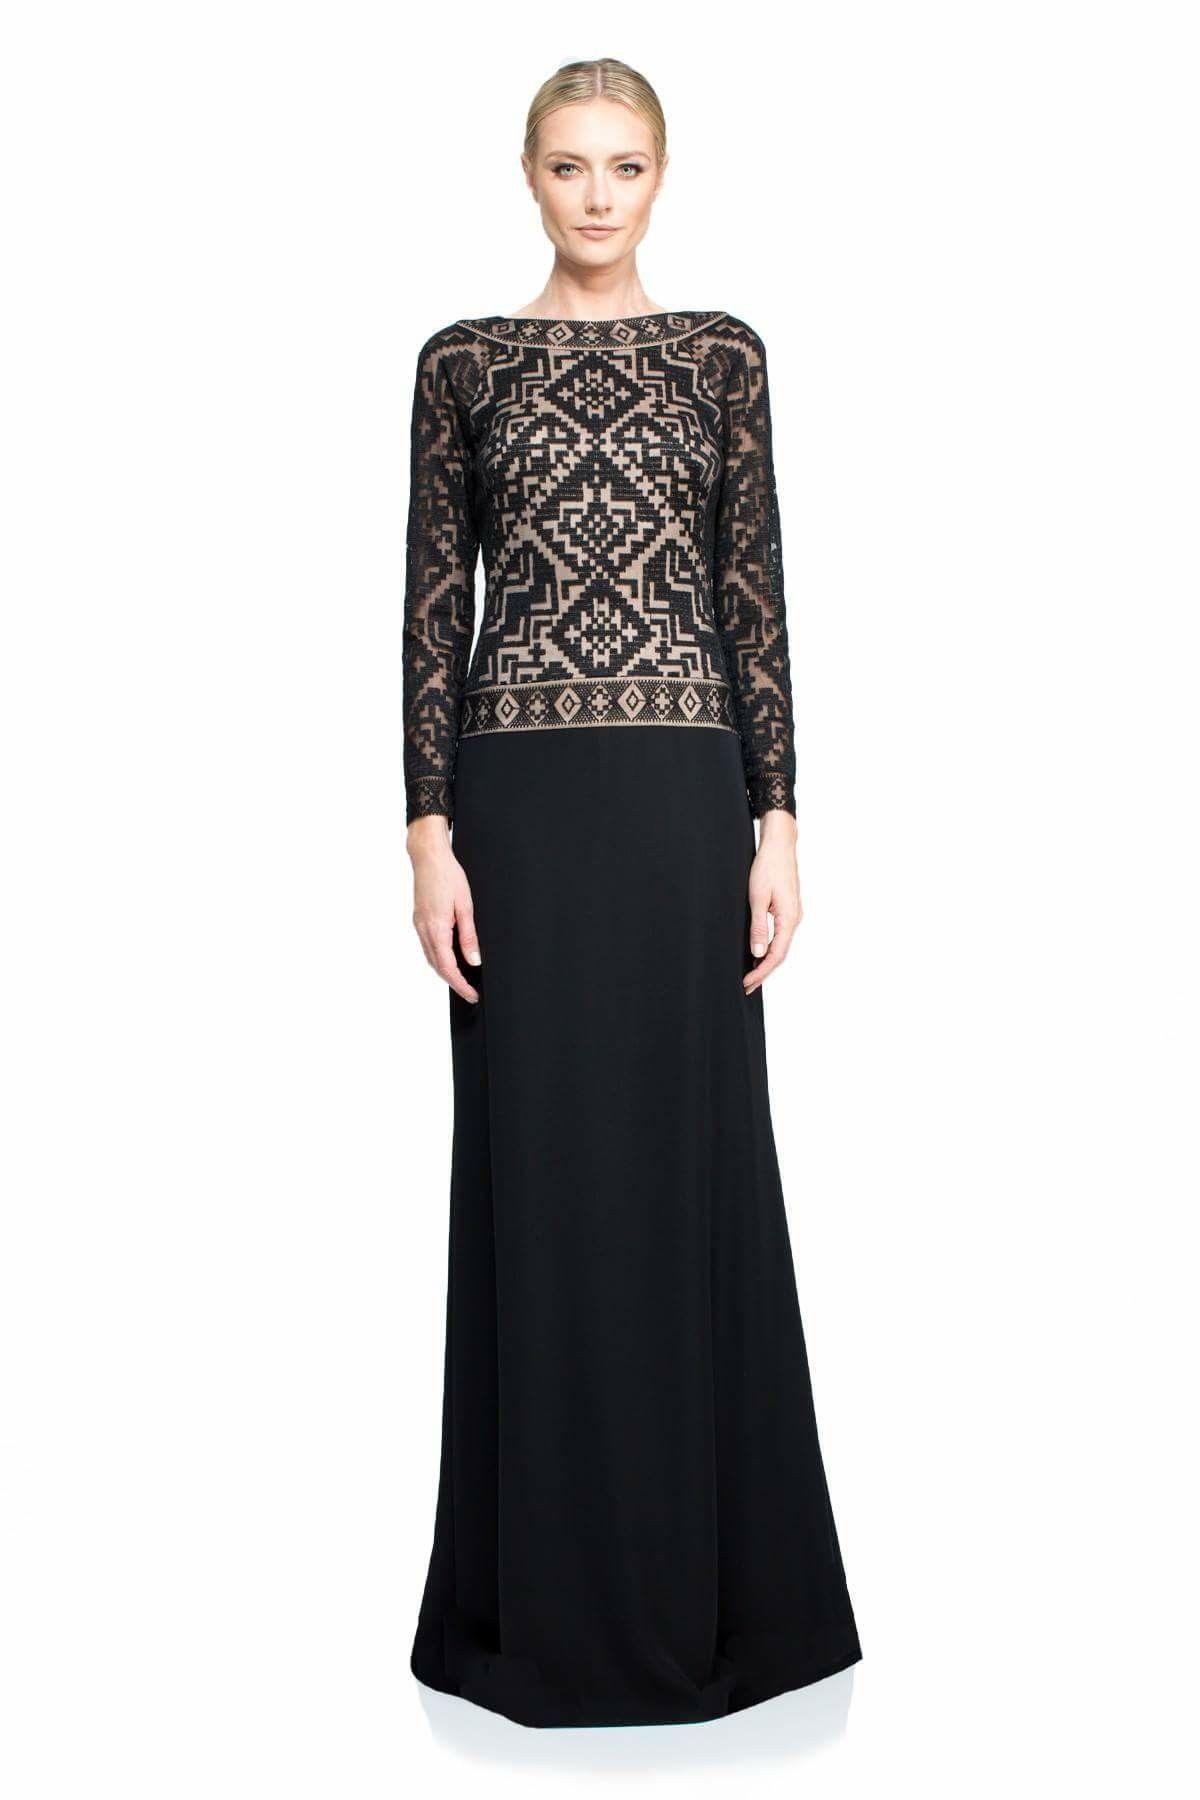 Dramatic Elegant Long Dresses